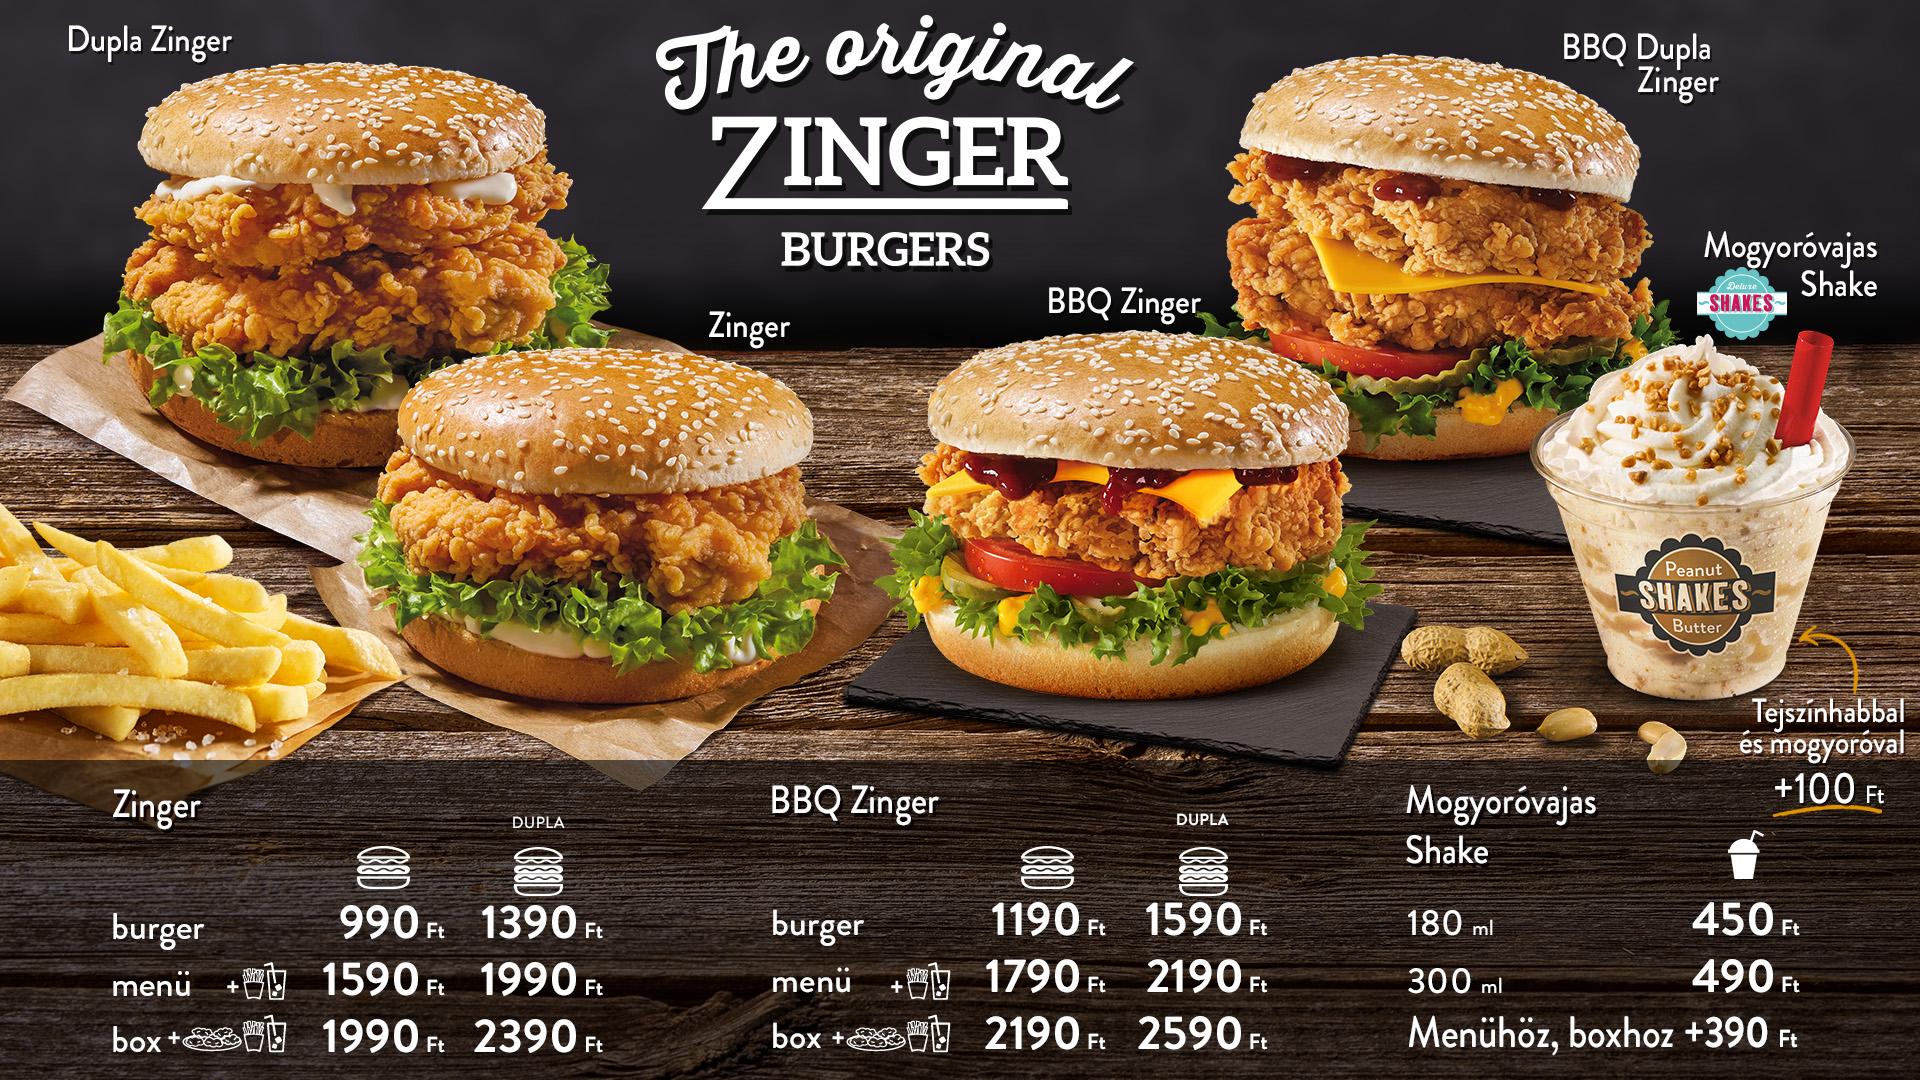 kfc_2018_zinger_burgers_dmb.JPG